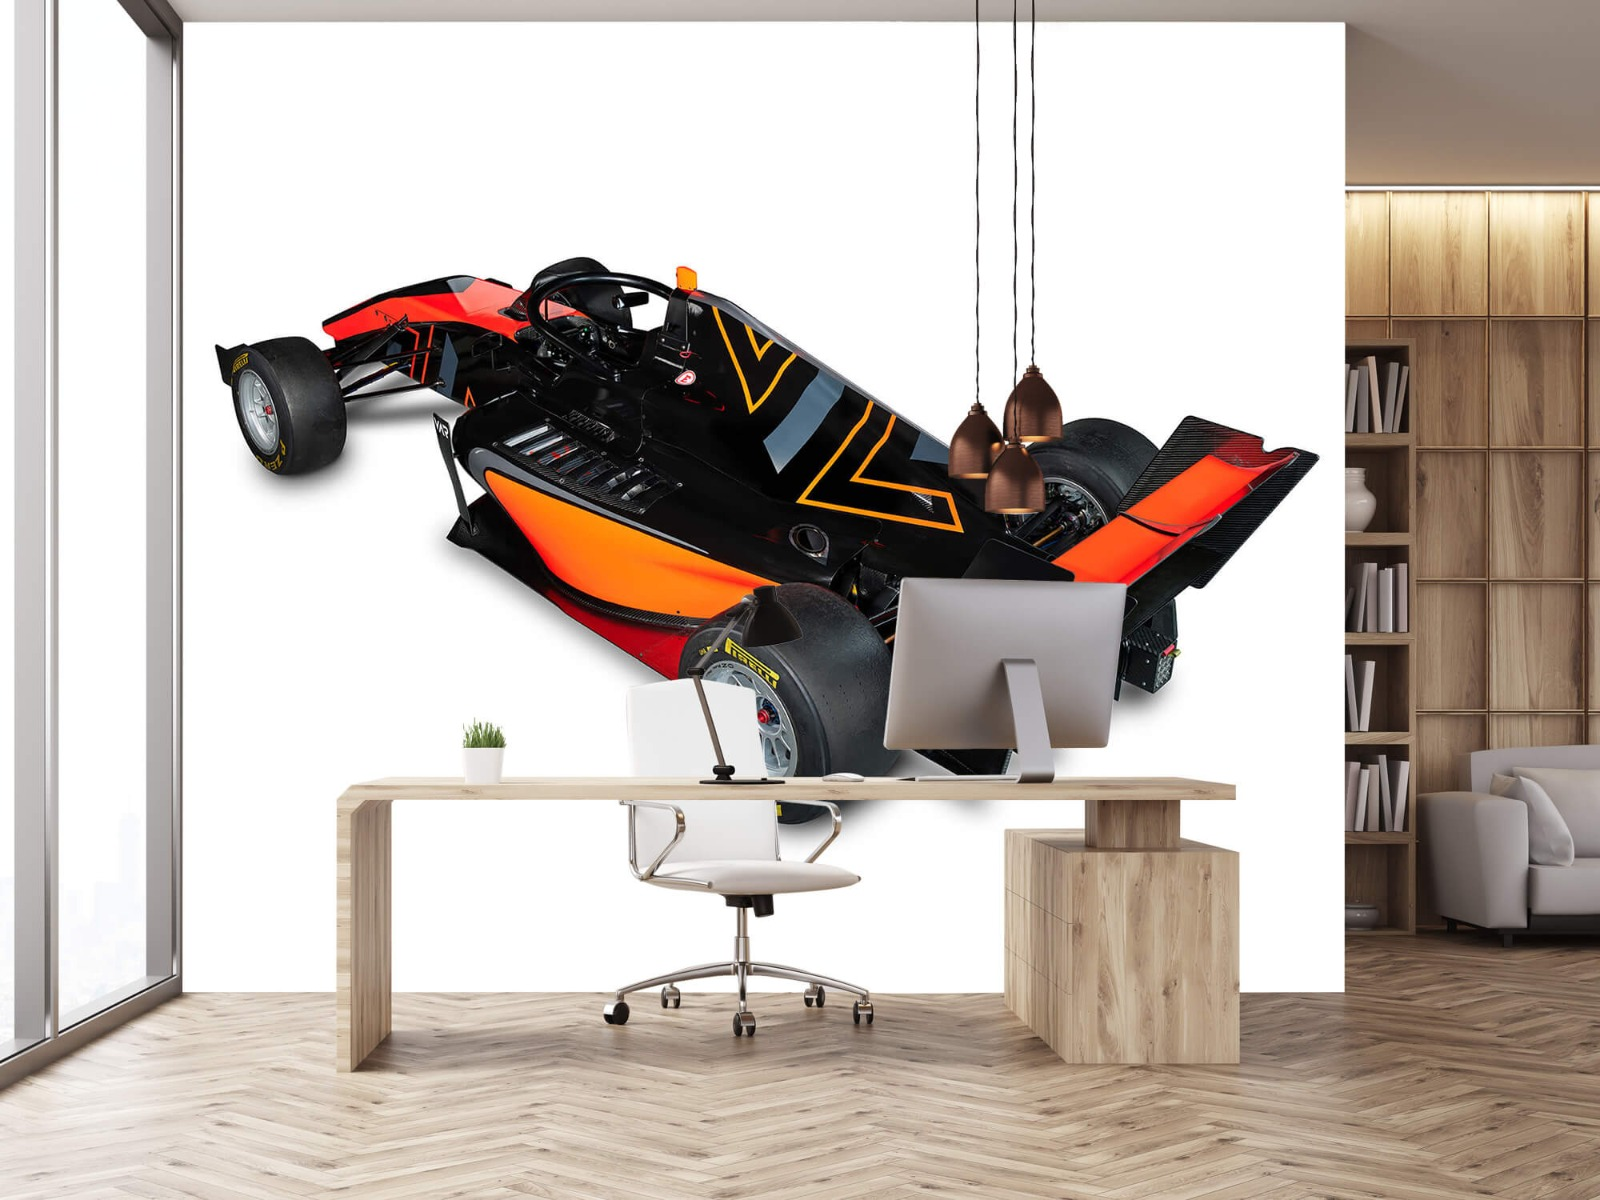 Sportauto's - Formula 3 - Rear left view - Hobbykamer 24